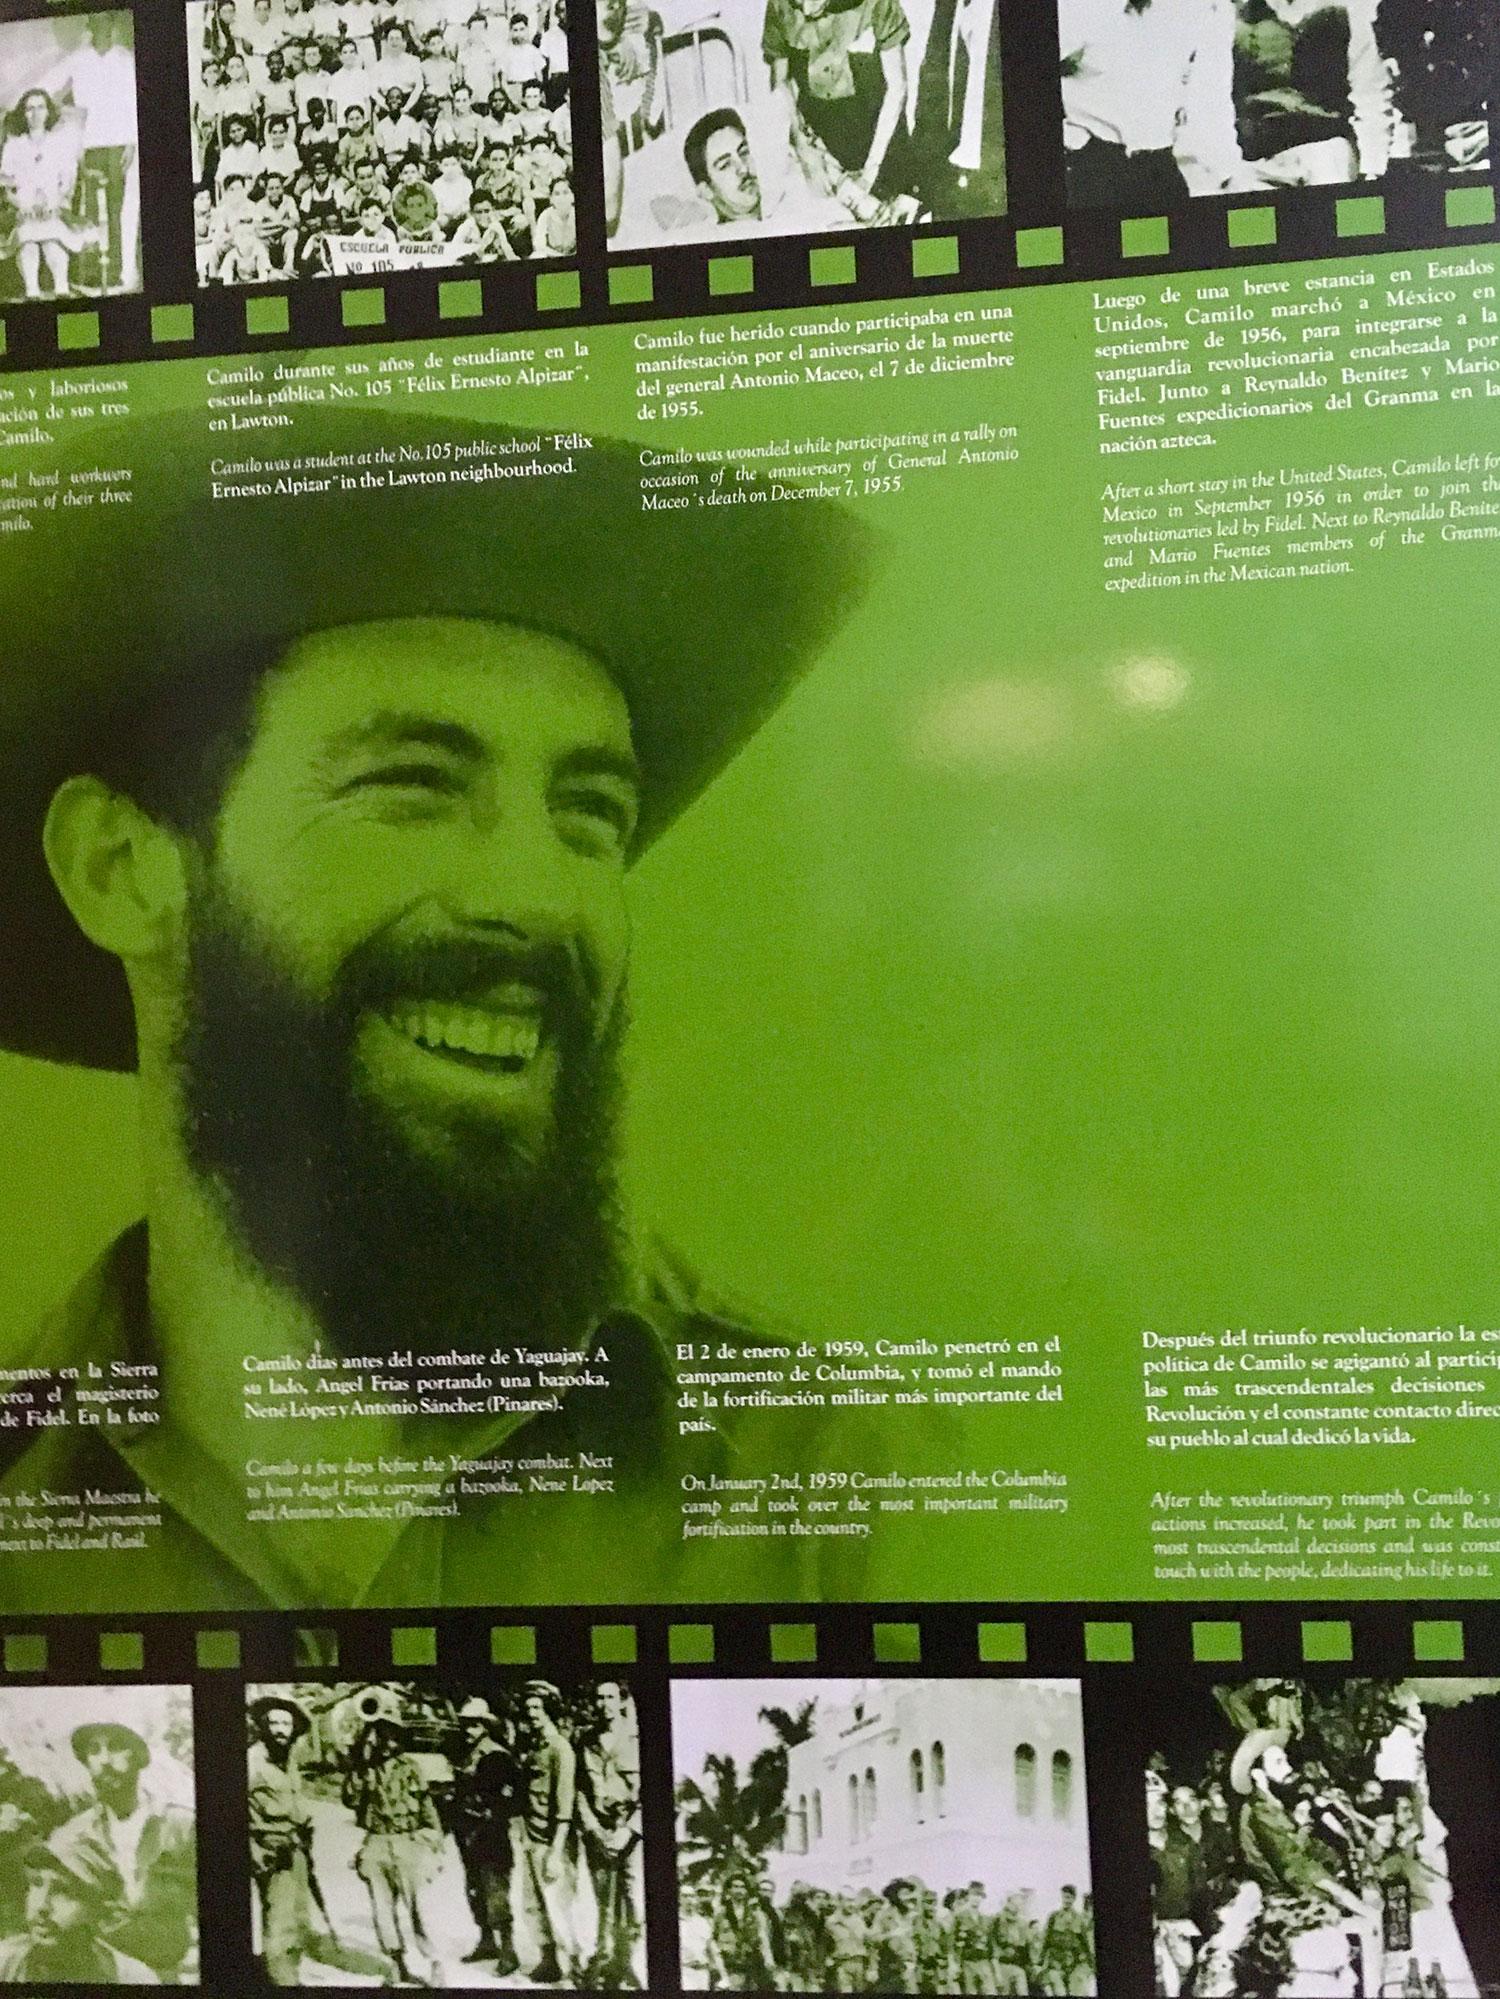 Fidel Castro at the Museum of Revolution in Havana.